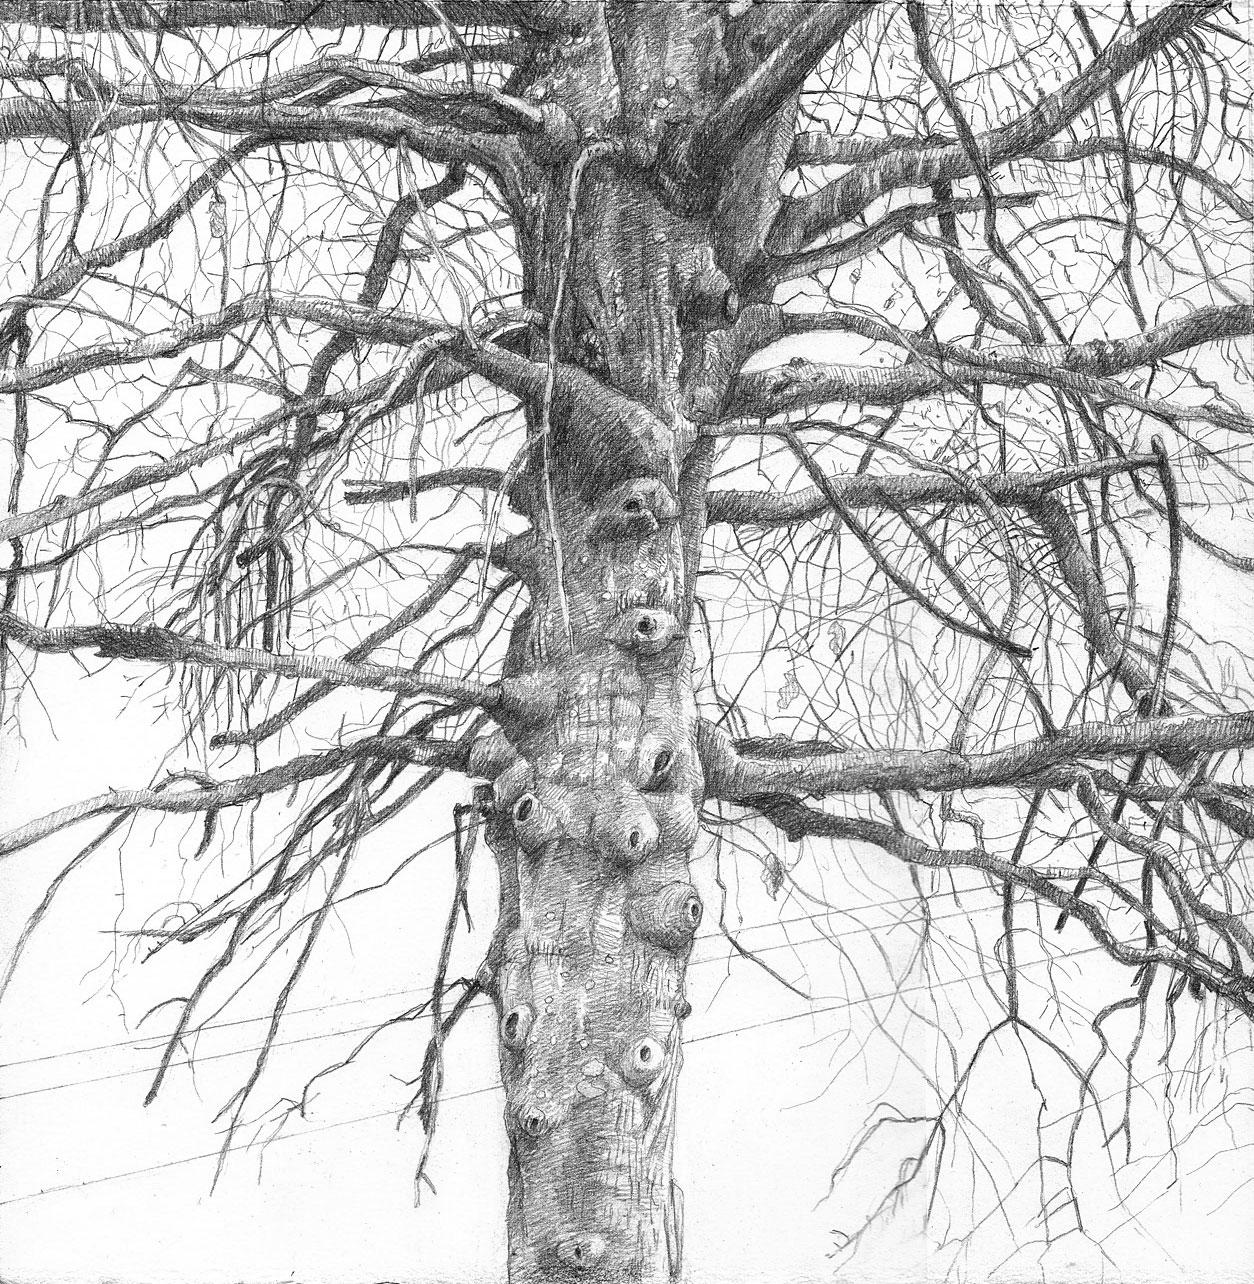 Parking Lot Tree (2)